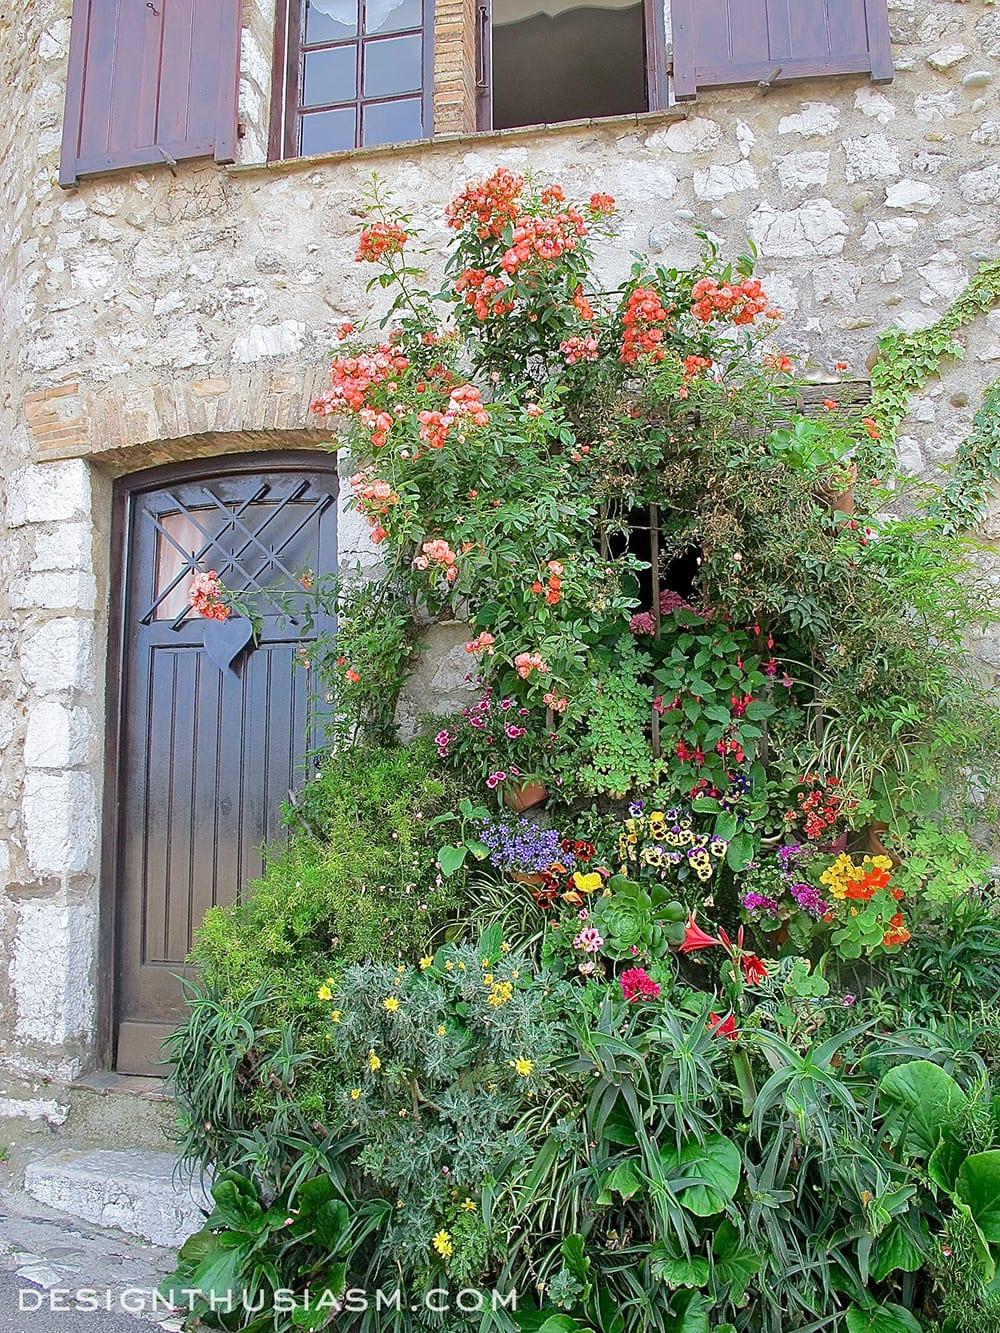 Saint-Paul-de-Vence: The Prettiest Hilltop Village in France